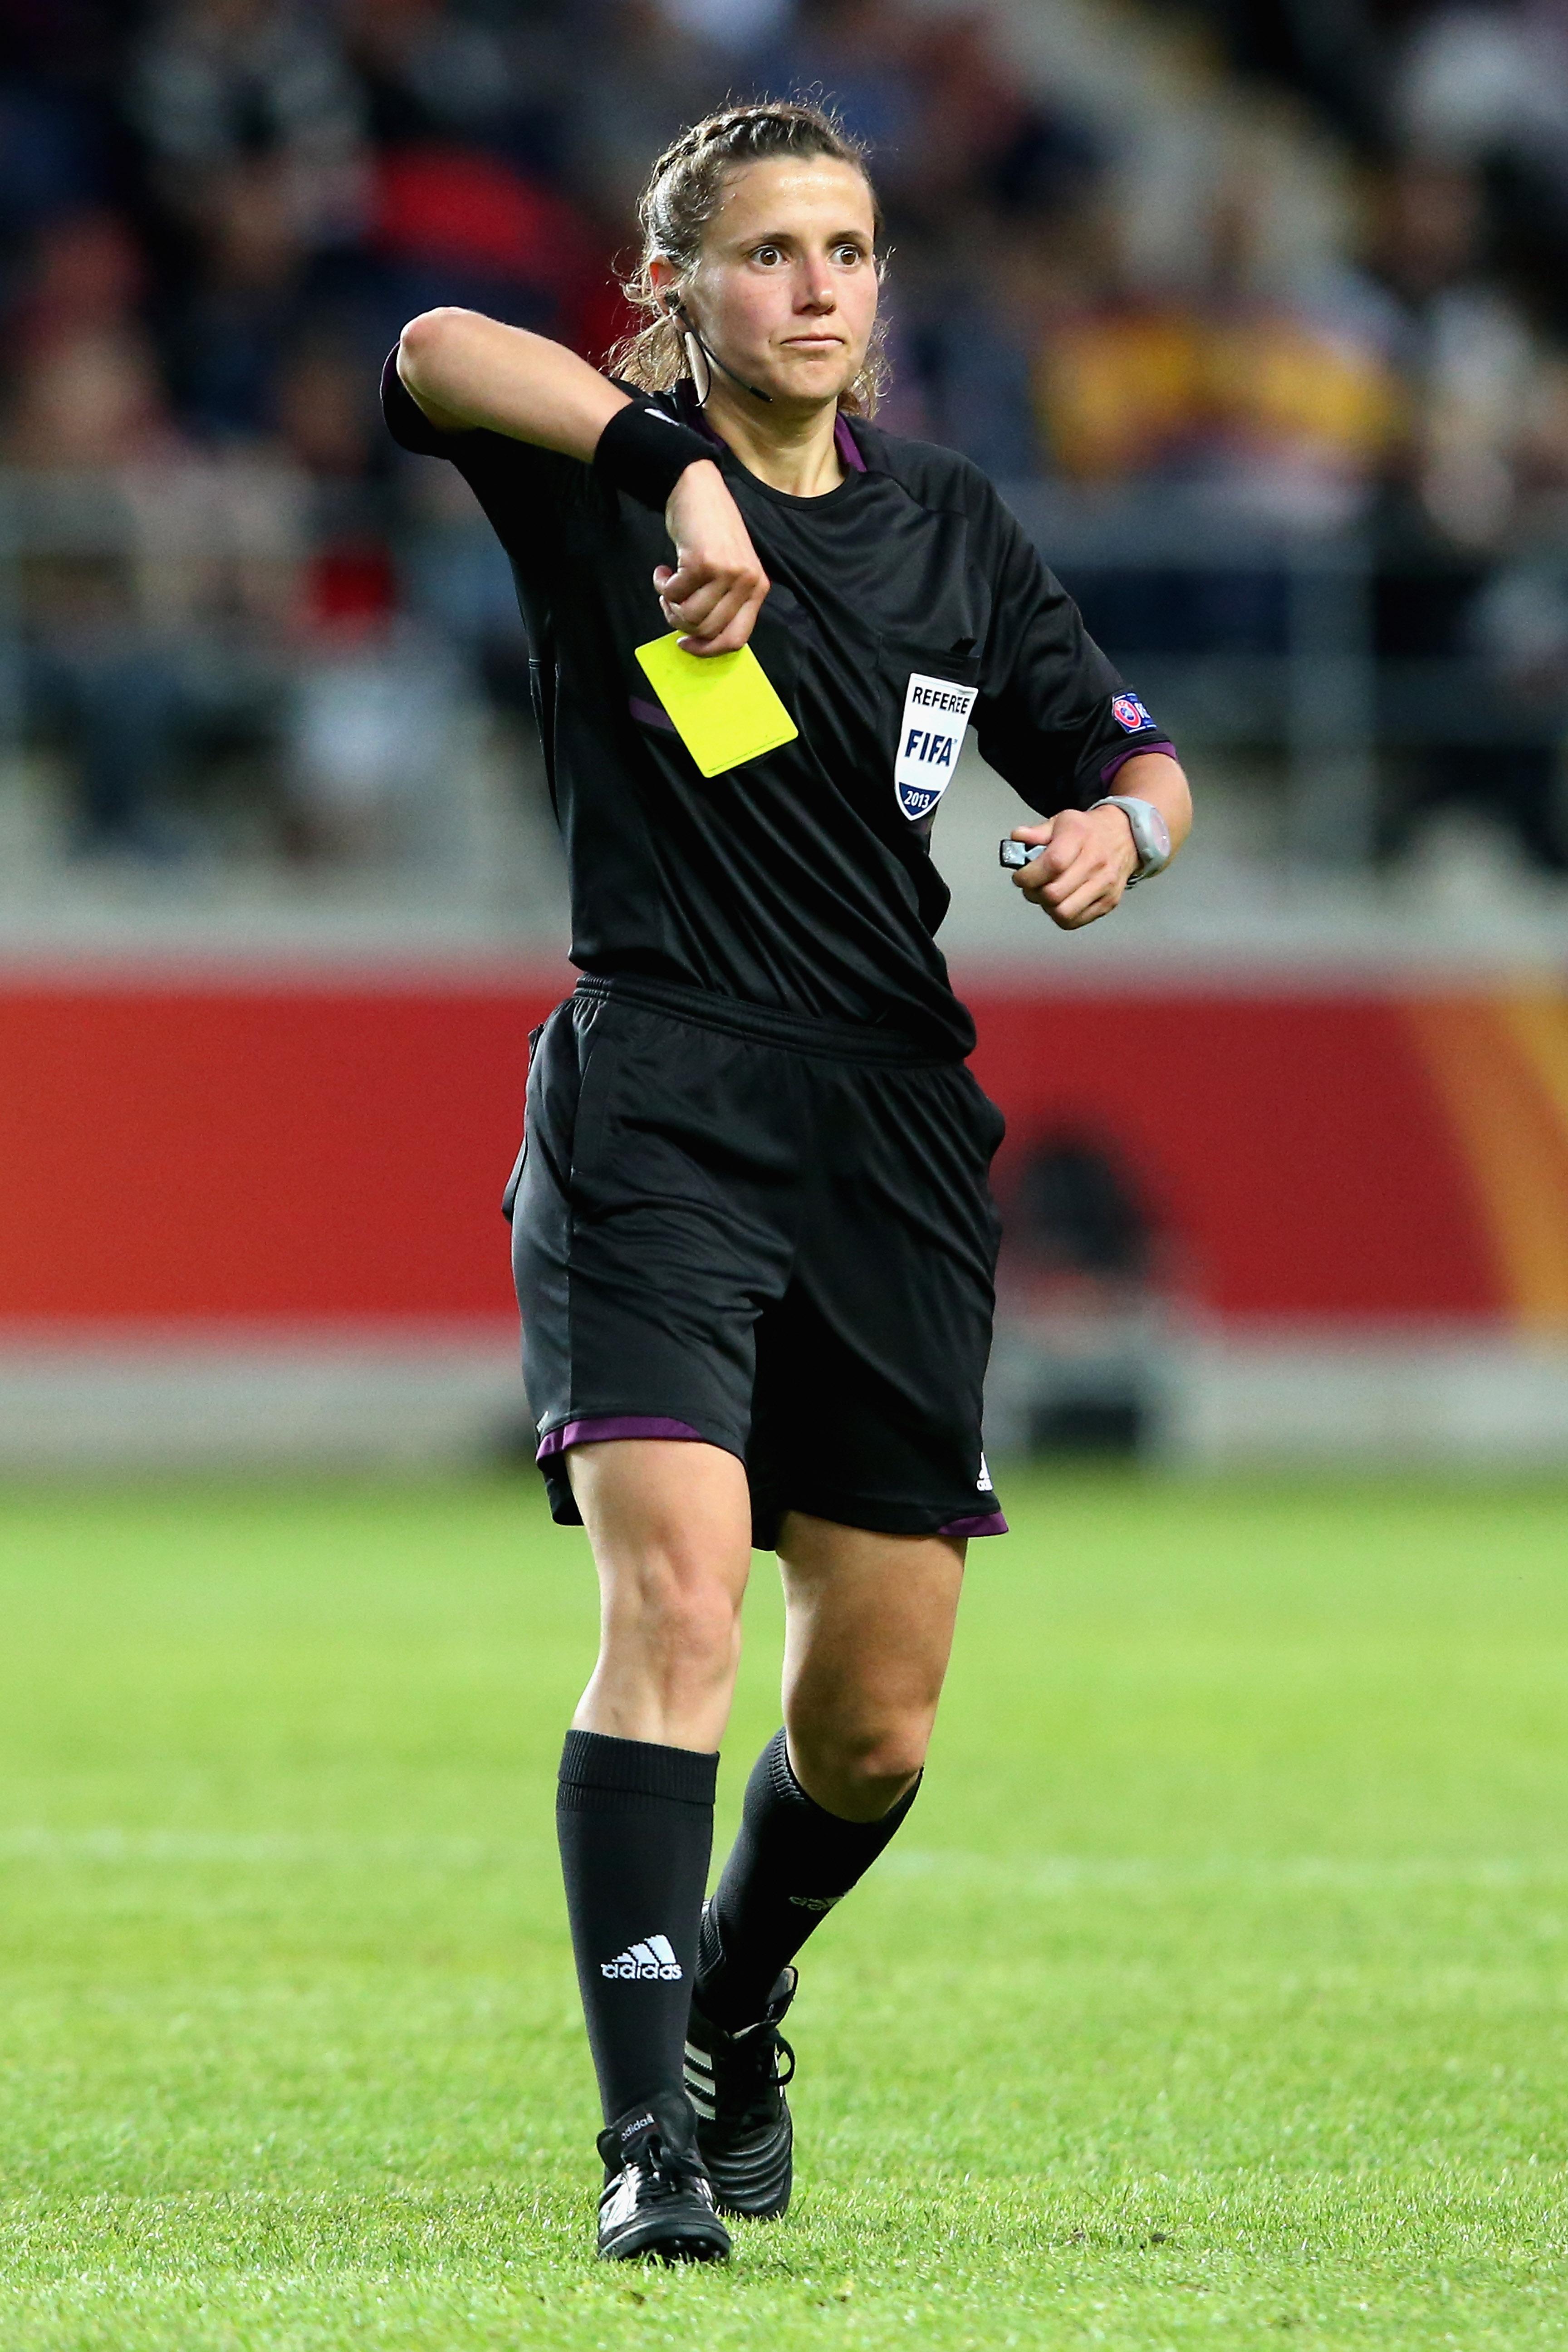 England v Spain - UEFA Women's Euro 2013: Group C